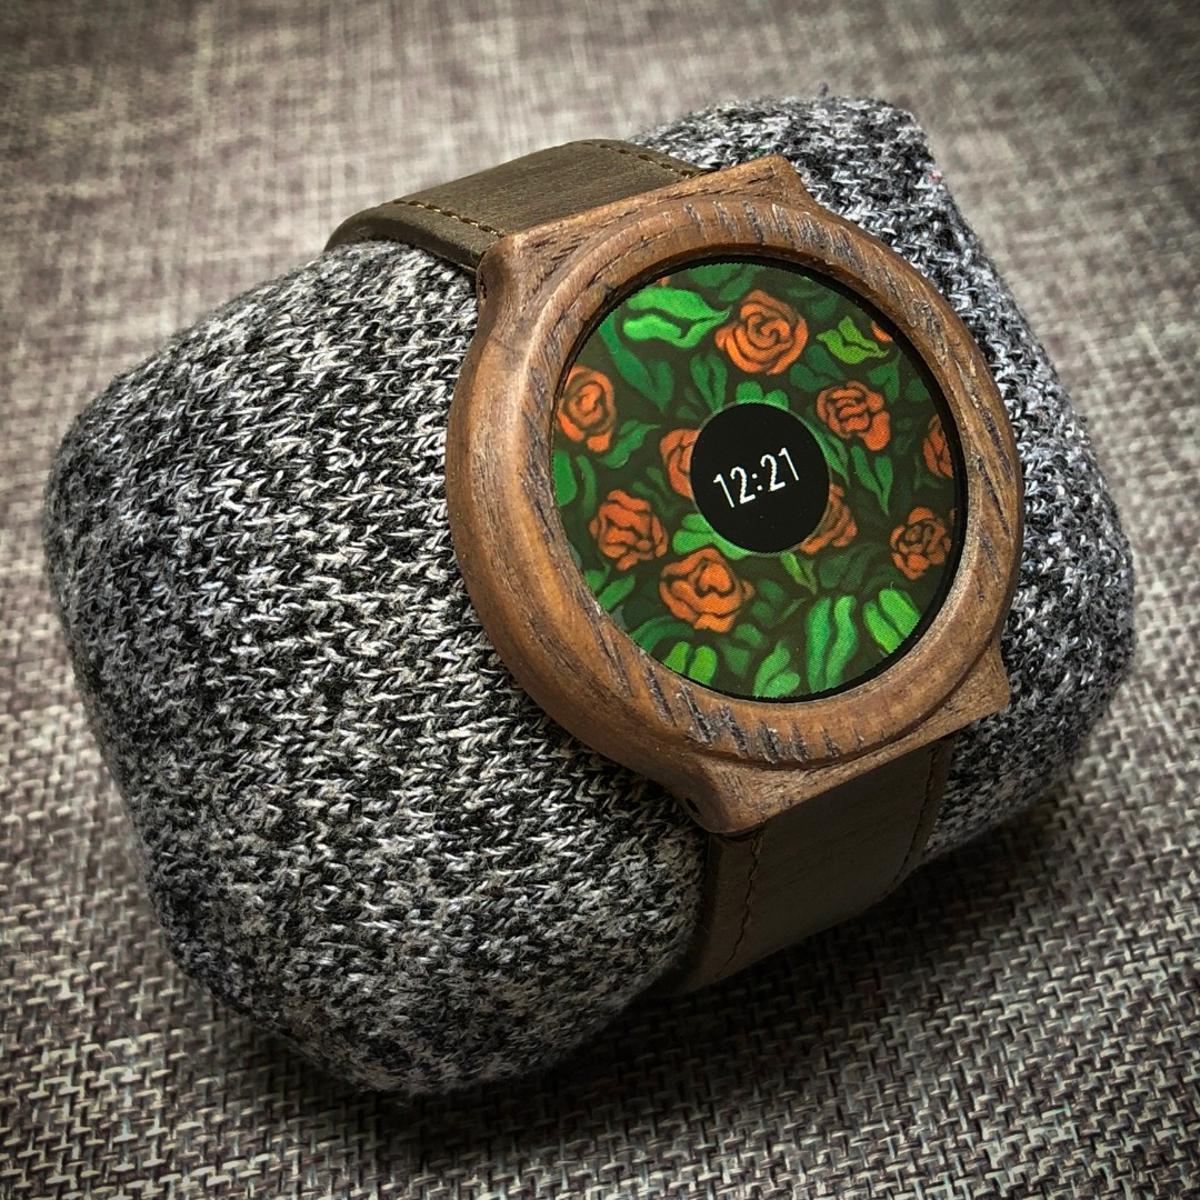 Samson March's DIY Smart Watch